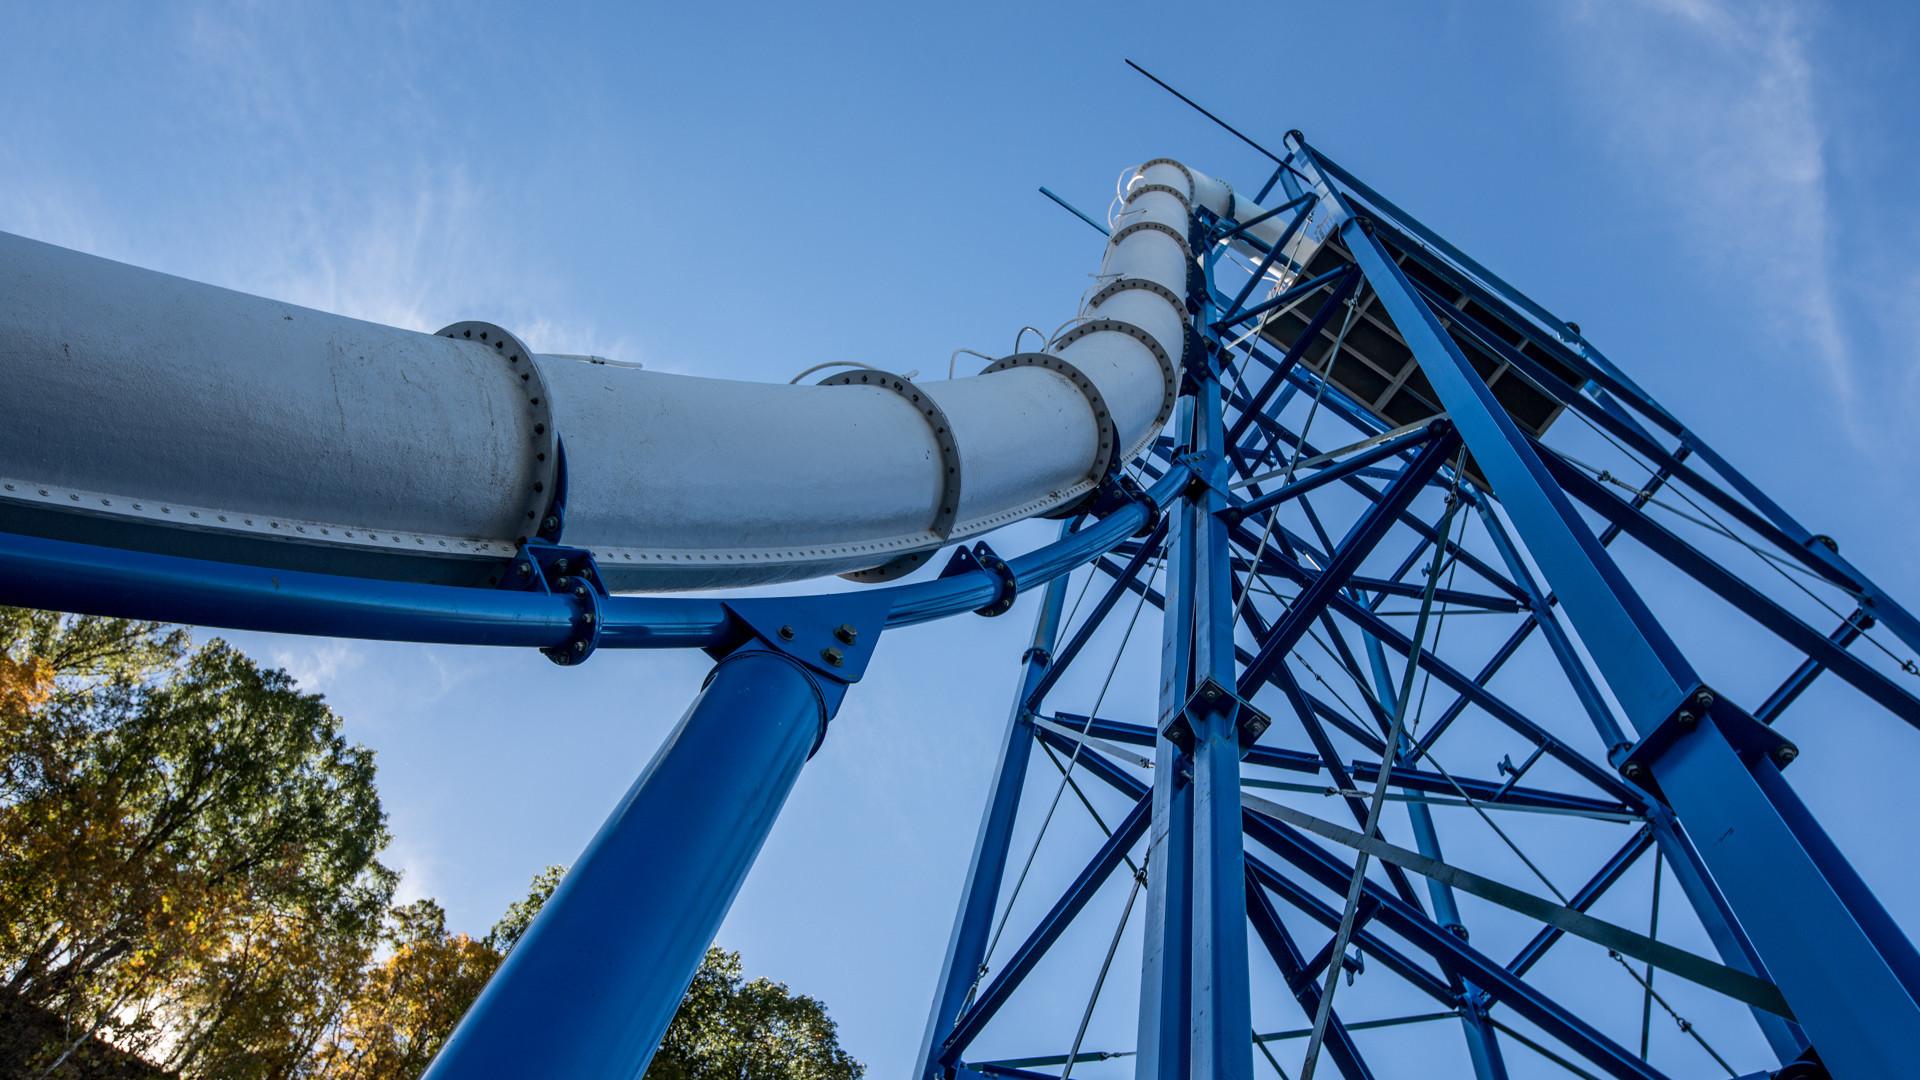 Rocket Water Slide Water Slide Planned For